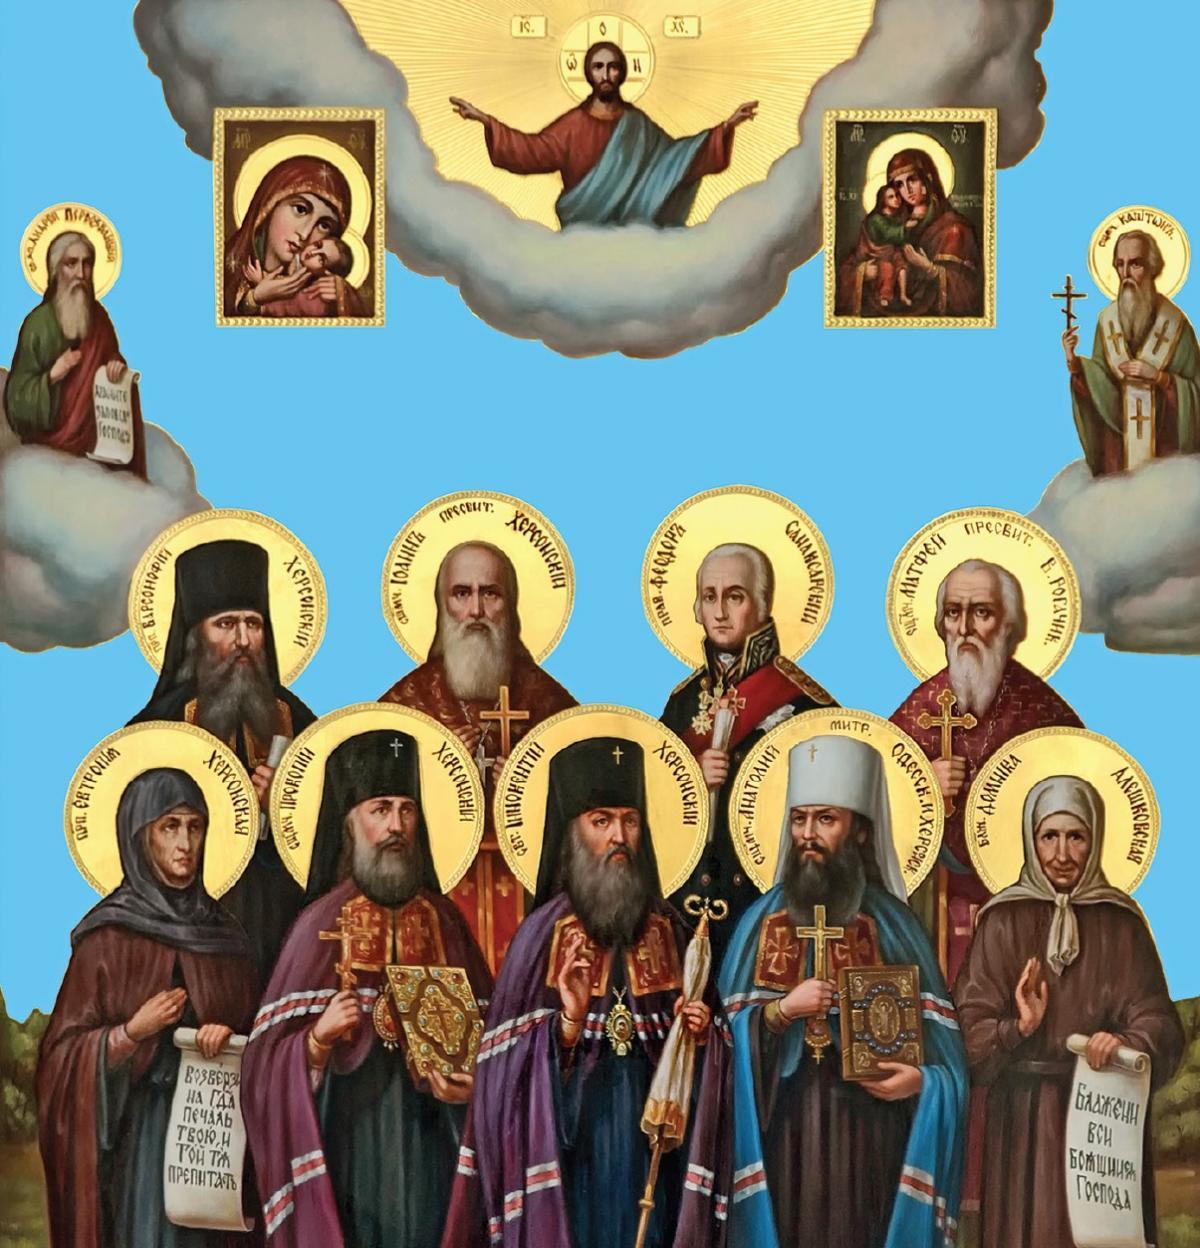 День святкування Собору Херсонських святих - 5 вересня / pravoslavie.ks.ua